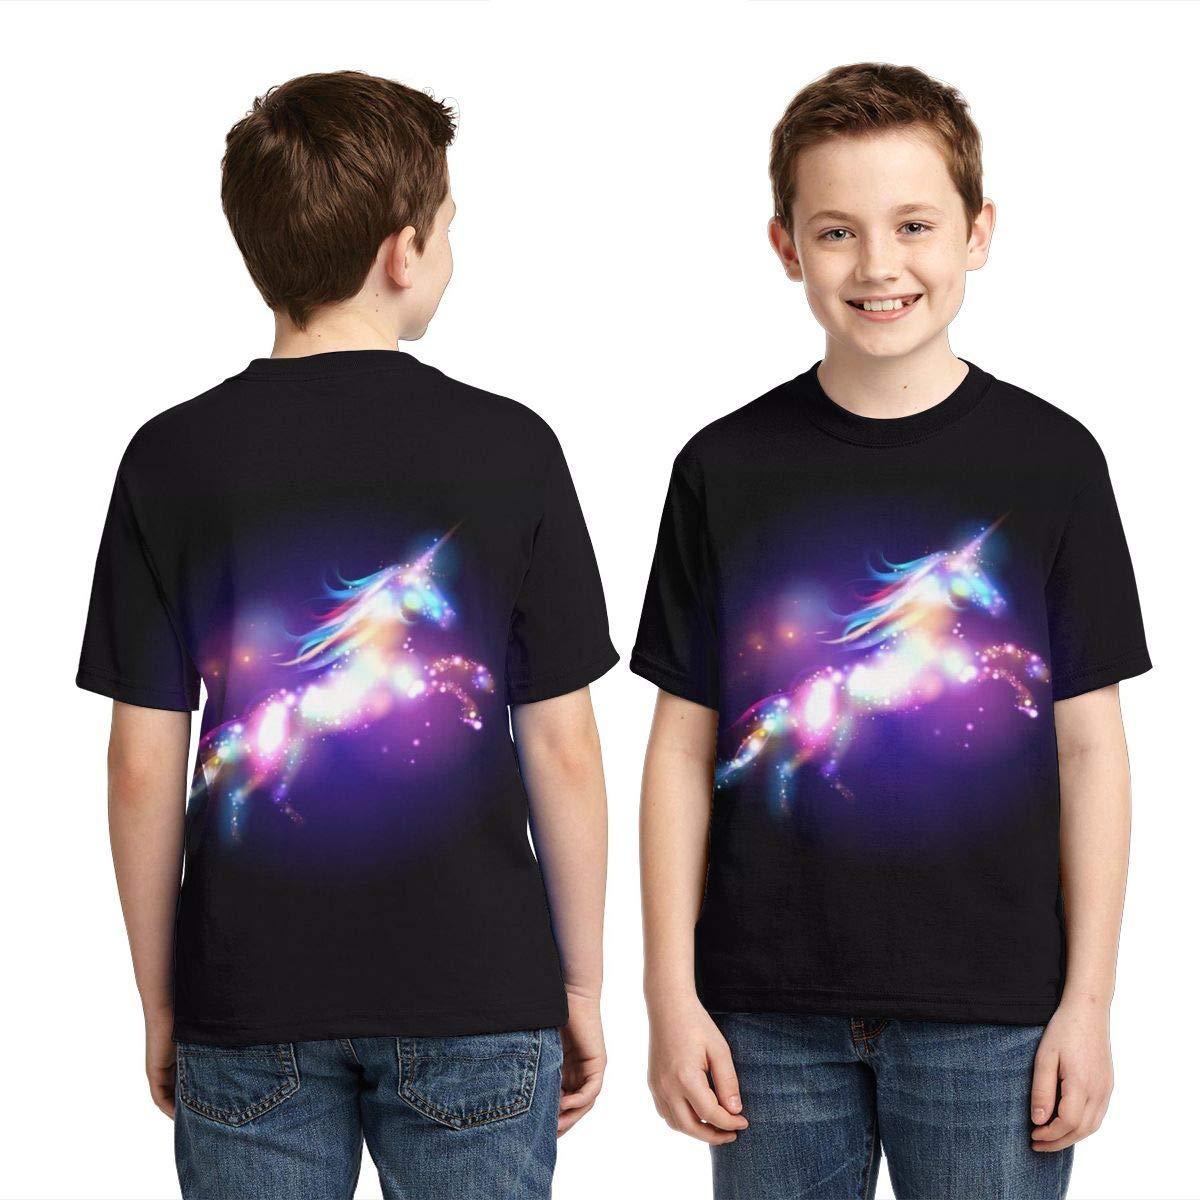 Dash Unicorn Unisex Child Teens Crew-Neck Short Sleeved T-Shirts Girls Boys Casual Tee Shirts Tops L